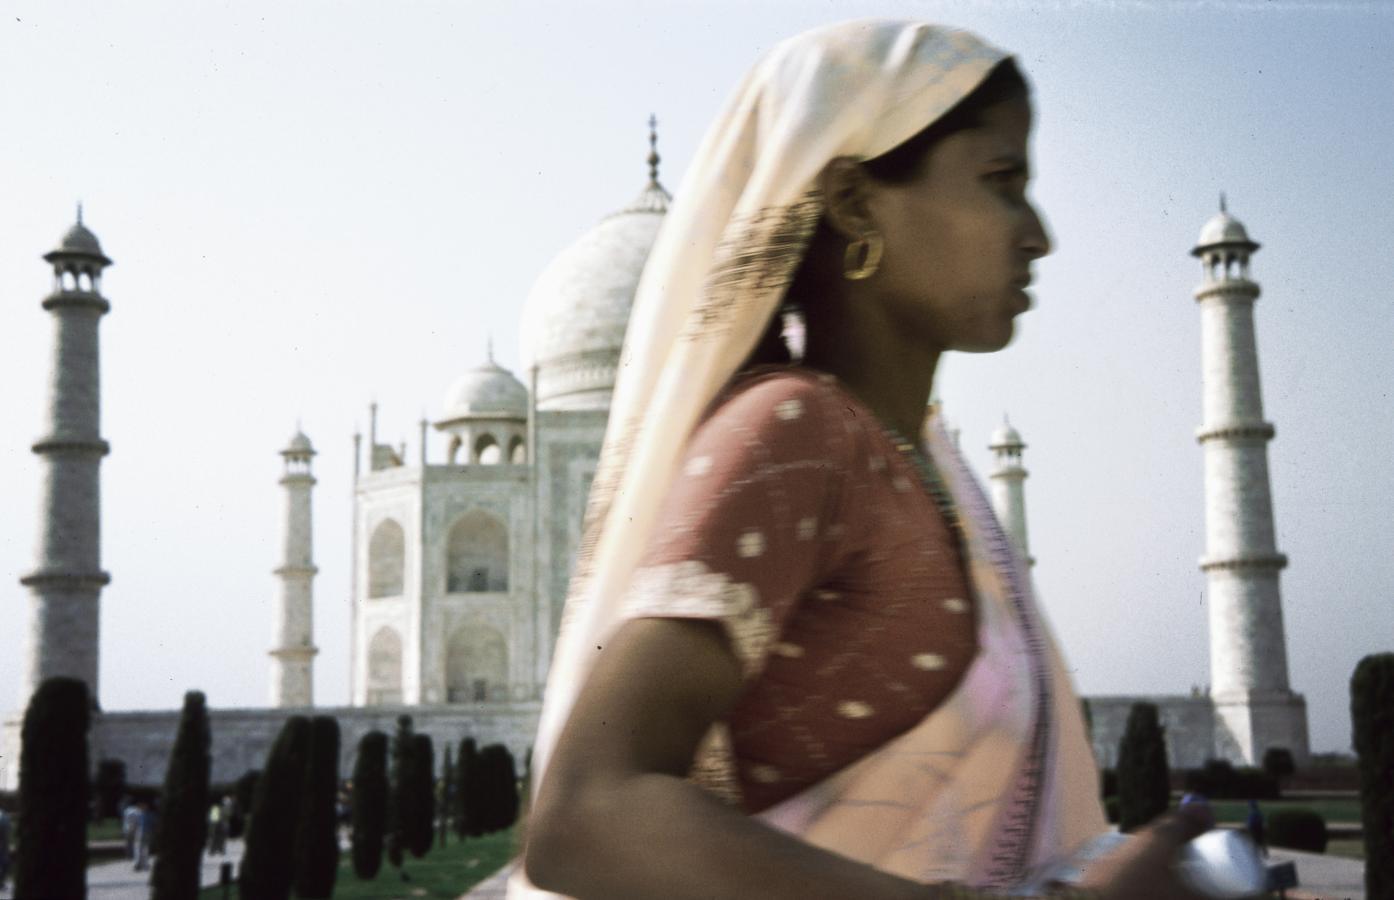 woman-in-front-of-the-taj-mahal-agra-2003